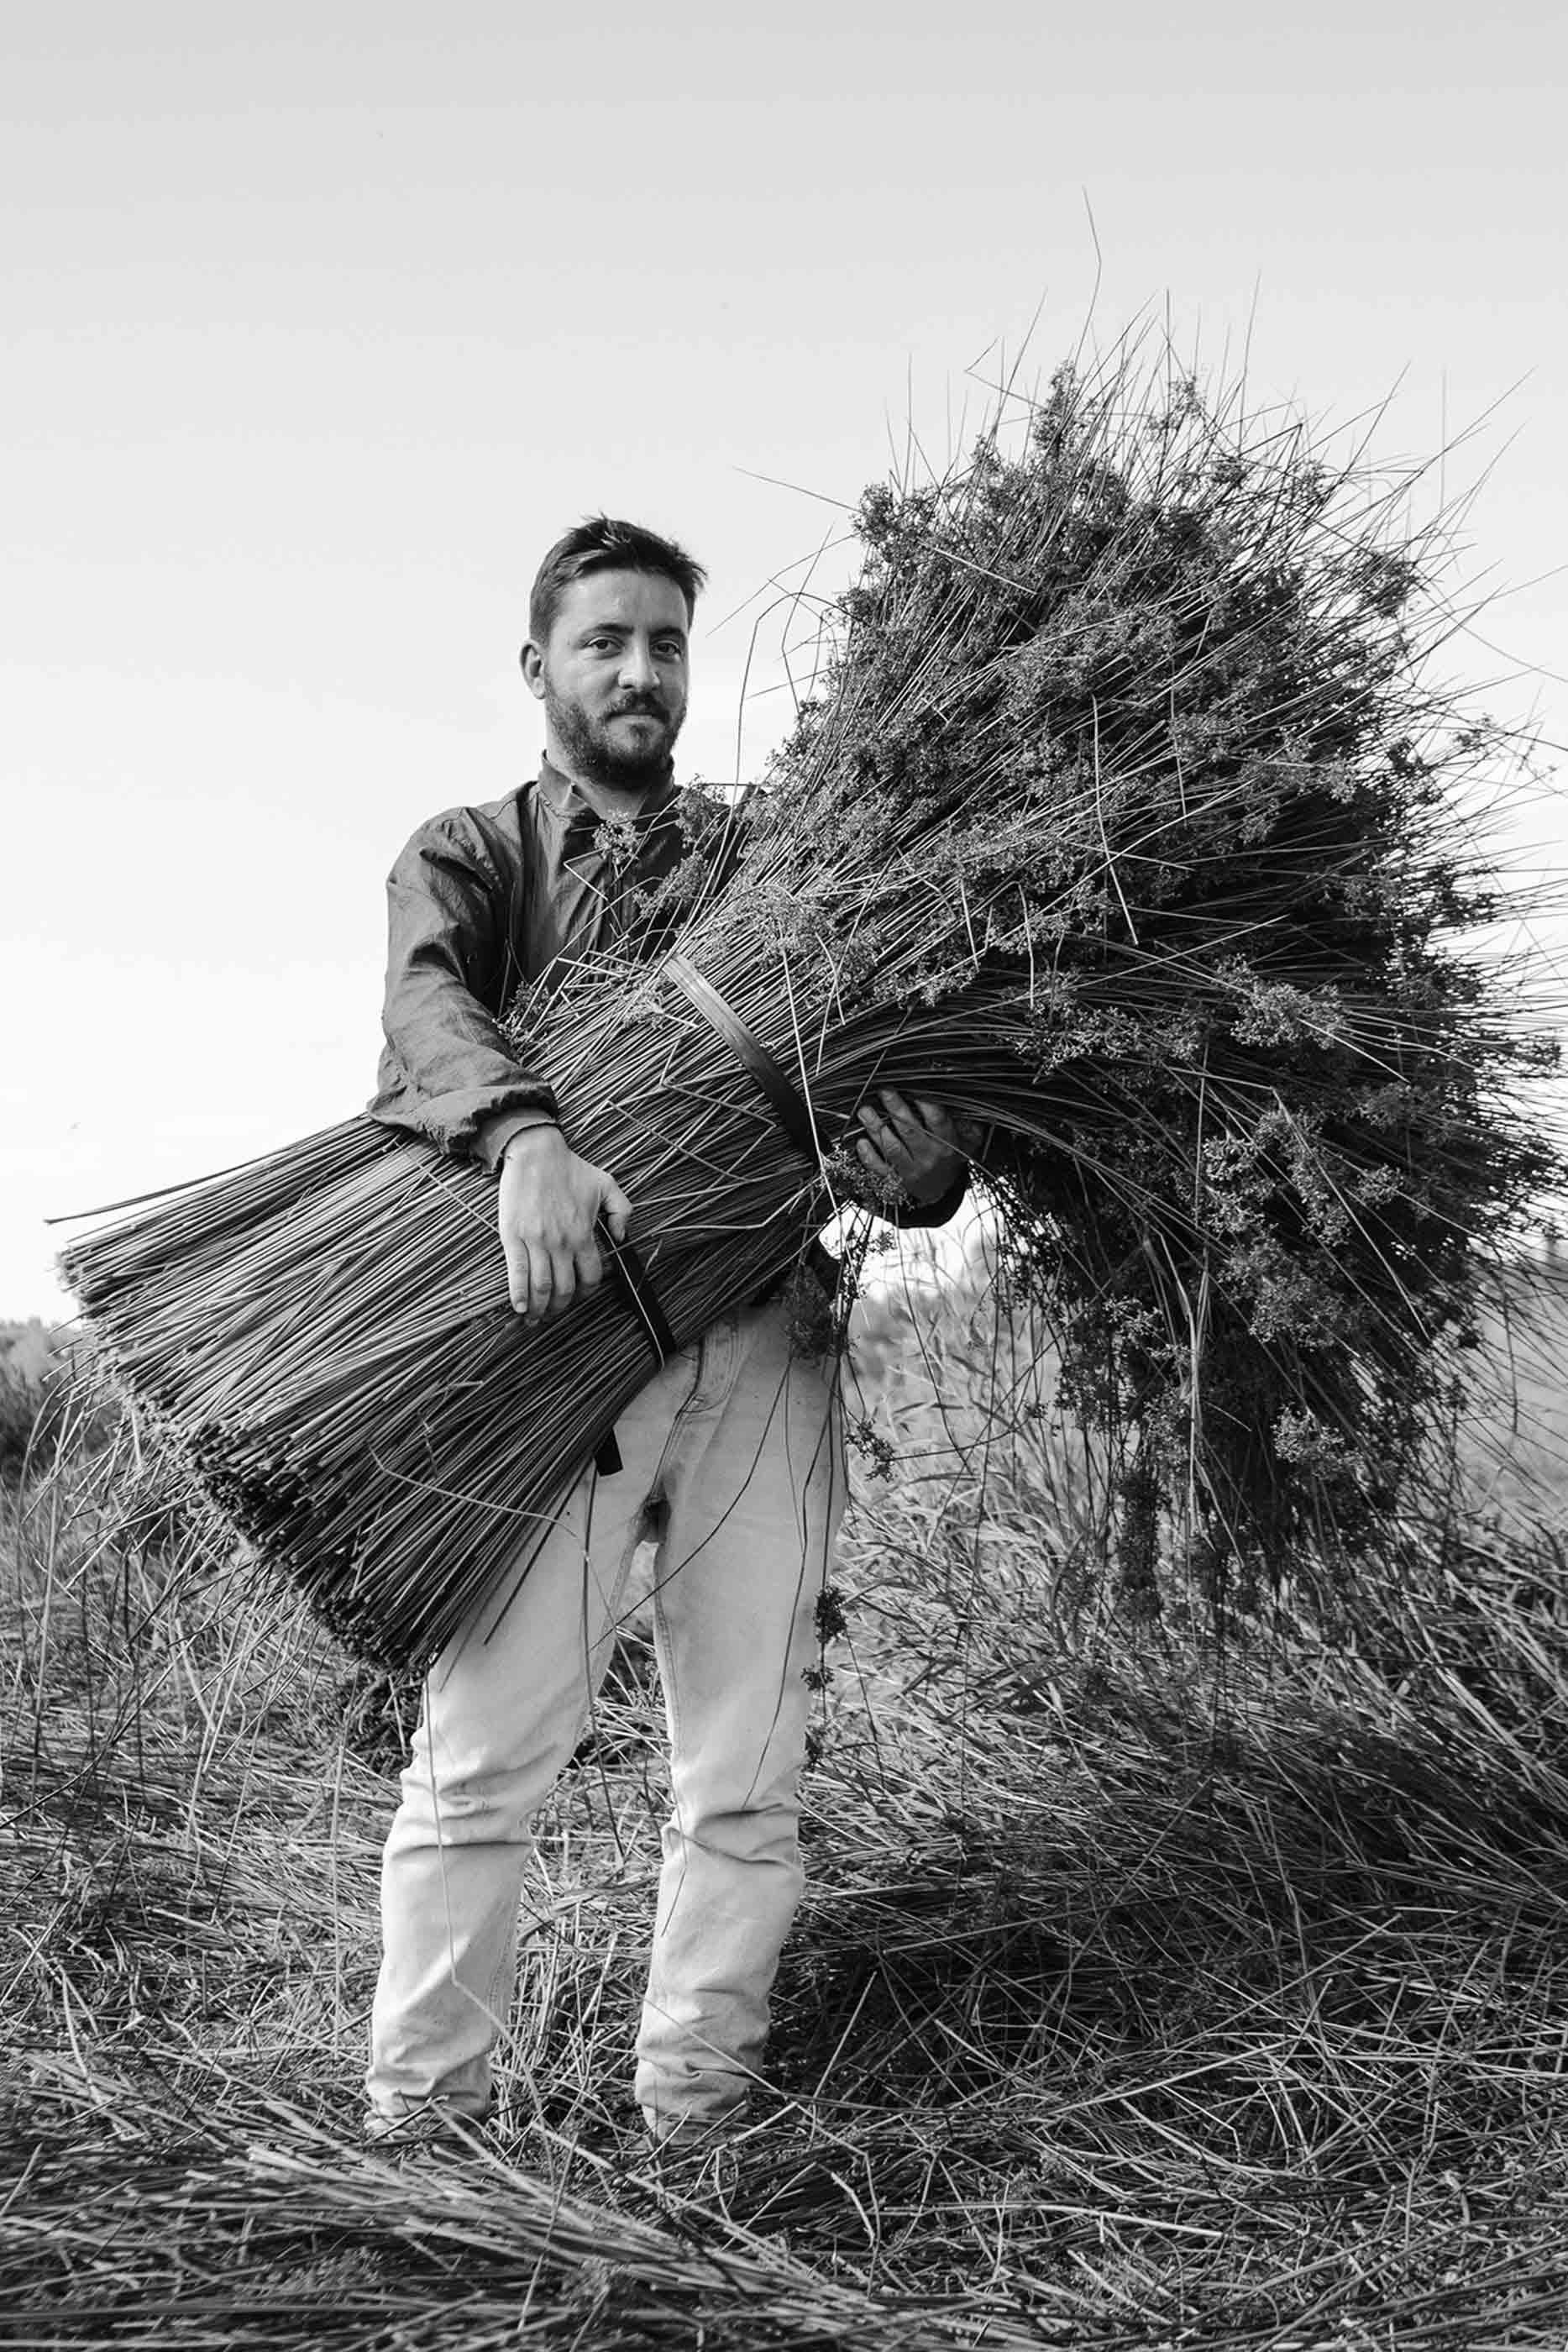 Foto a preto e branco de Nuno Henriques, criador da marca TOINO ABEL, a segurar um grande ramo de junco, no campo